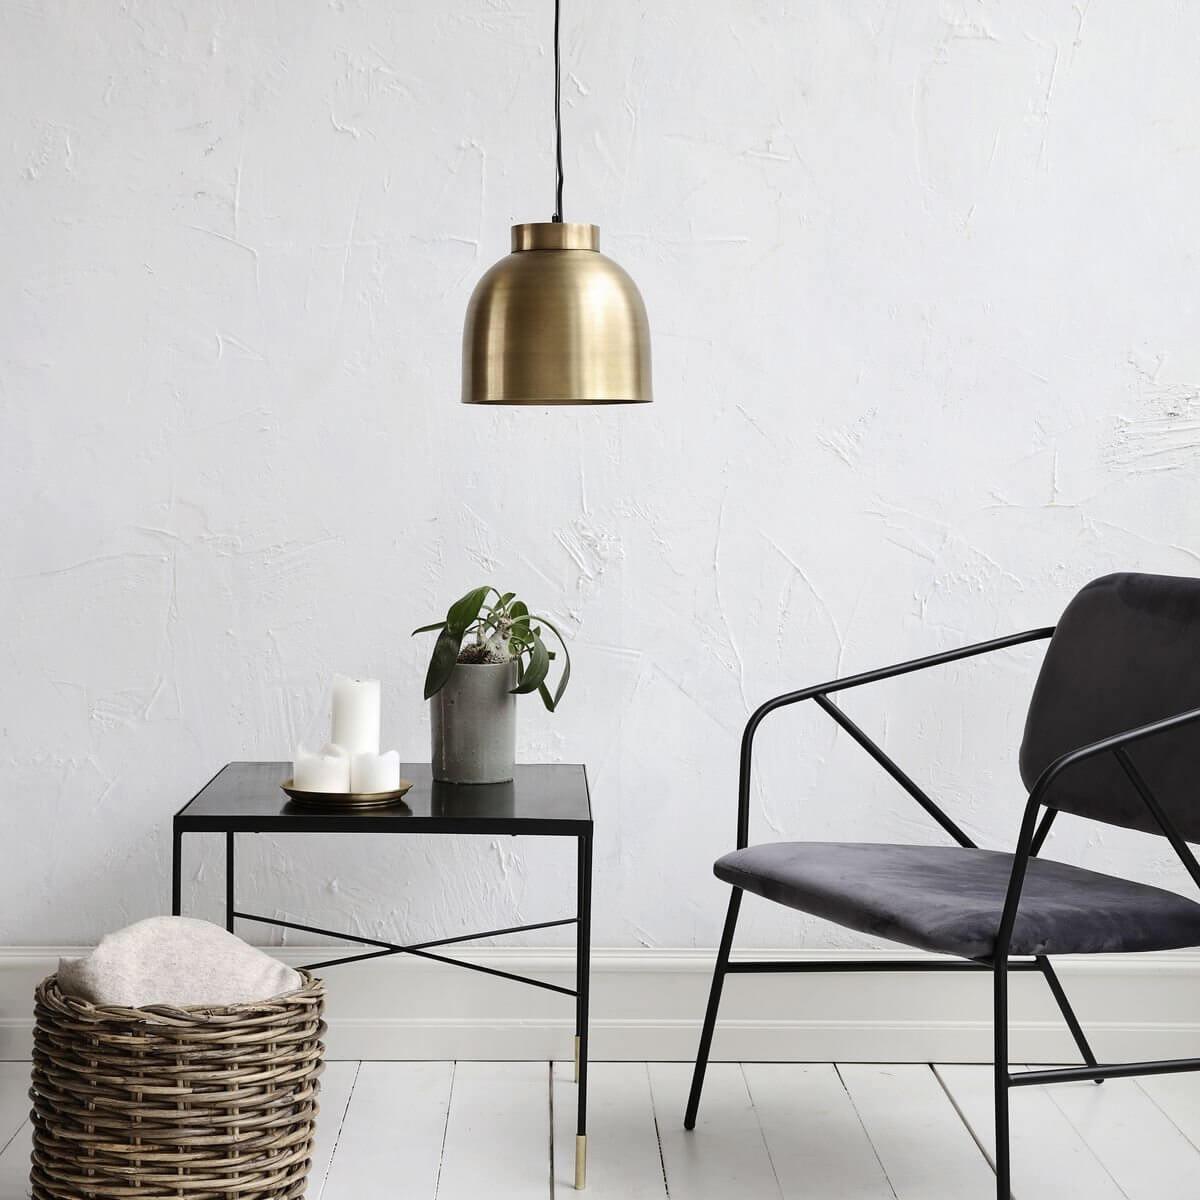 Brass Bowl Pendant Light - Small